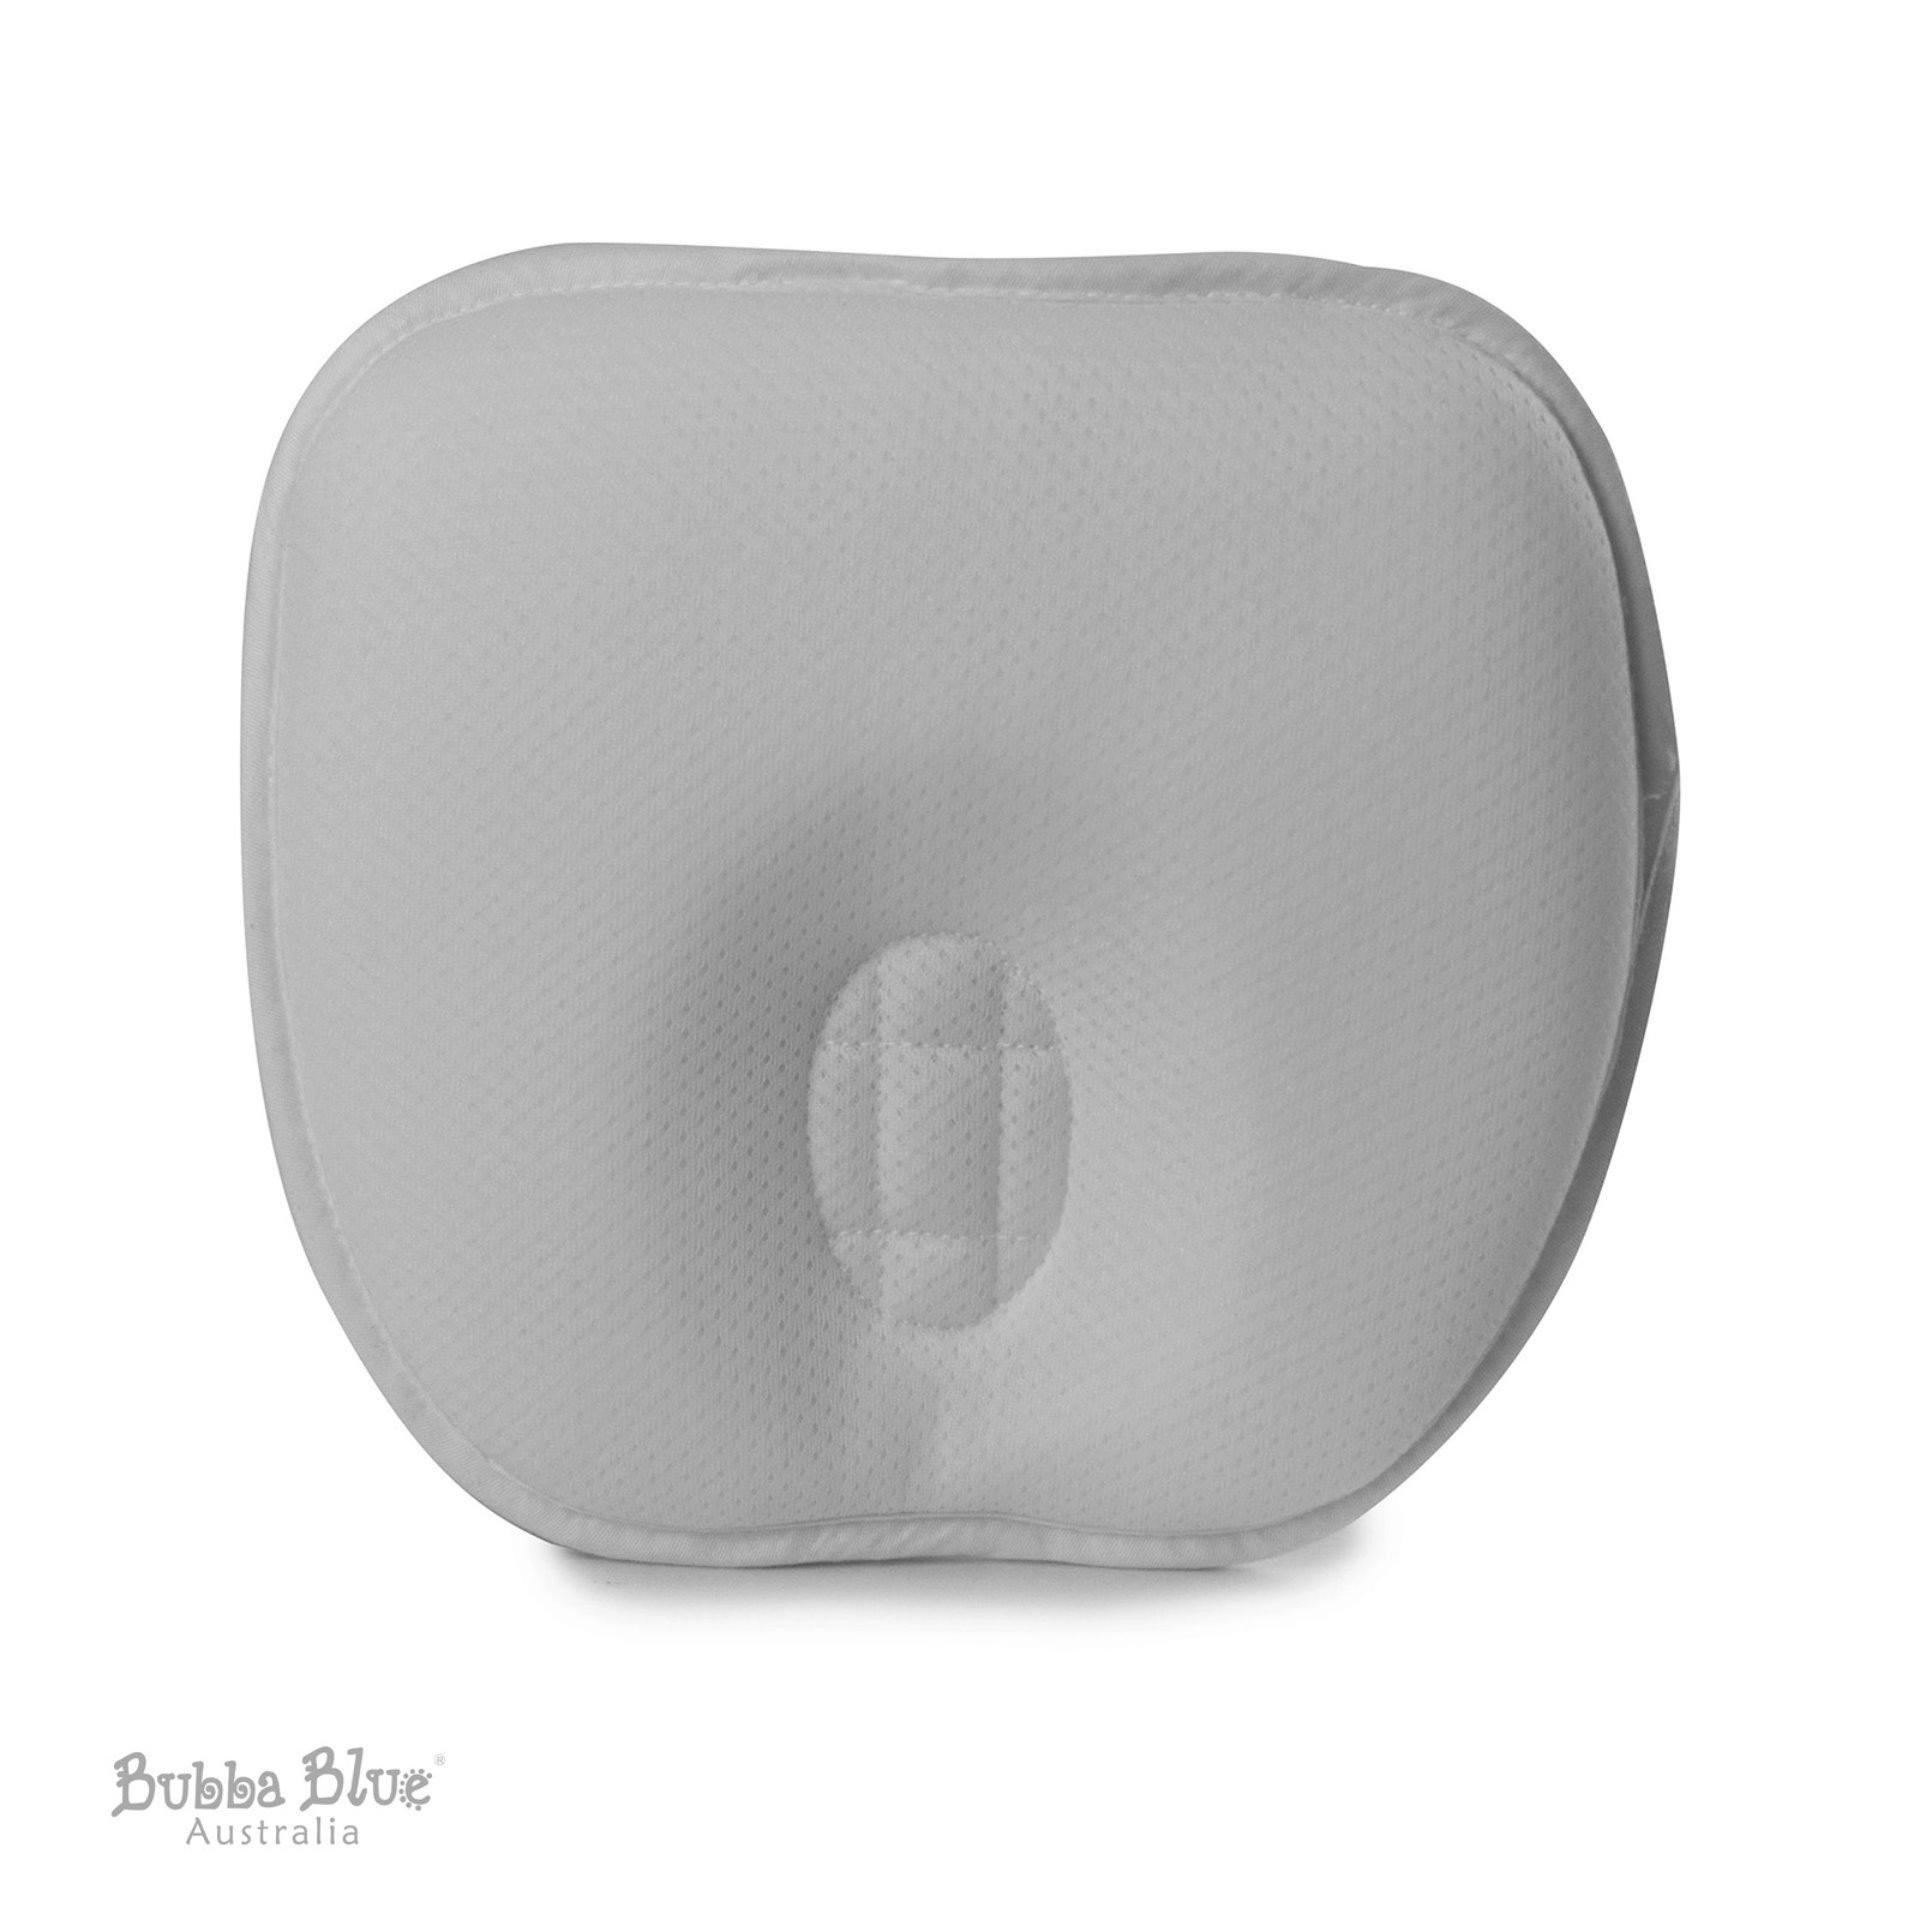 Bubba Blue Breathe Easy® Infant Head Rest - Grey